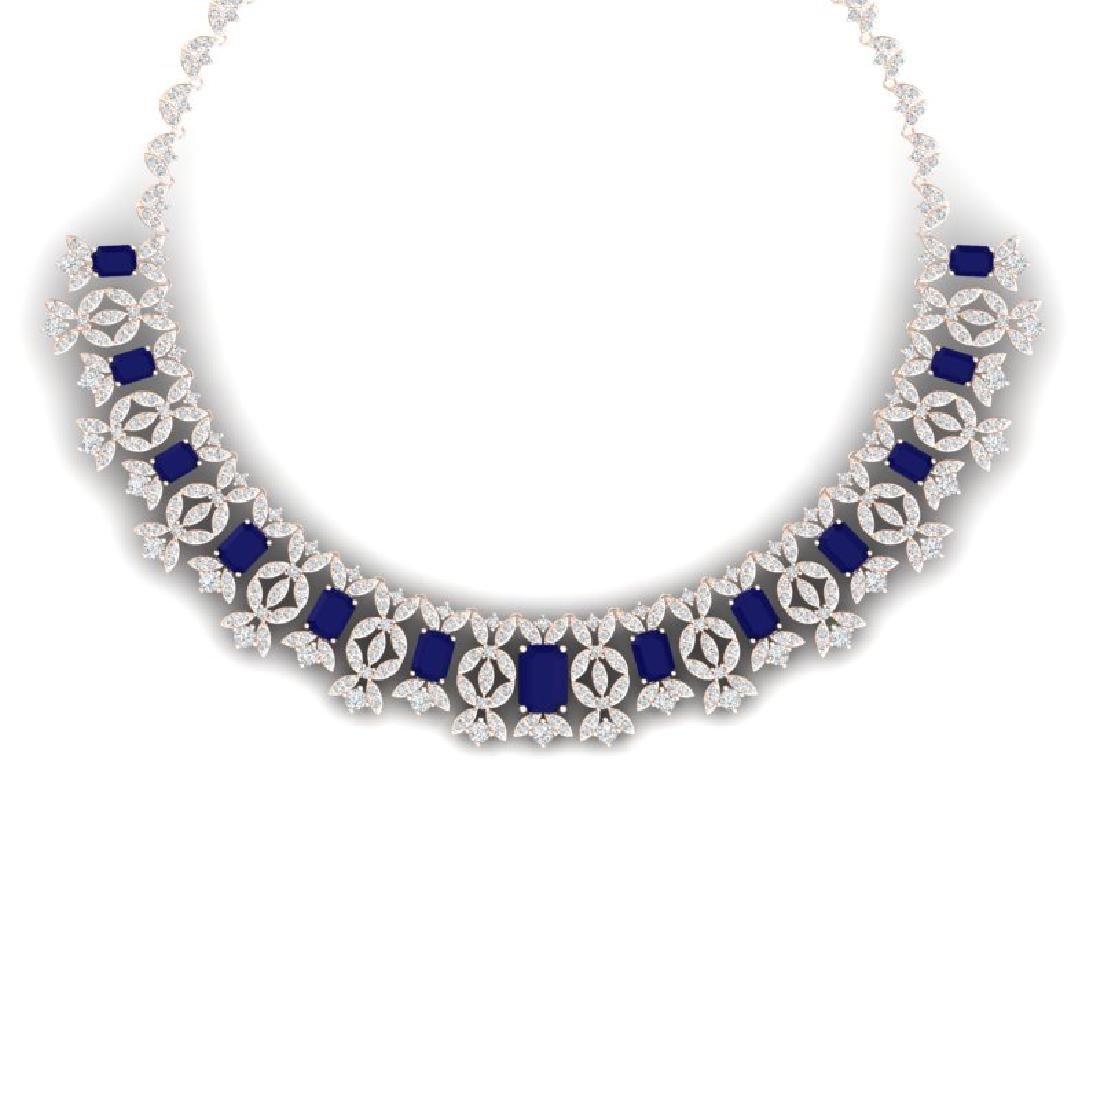 50.44 CTW Royalty Sapphire & VS Diamond Necklace 18K